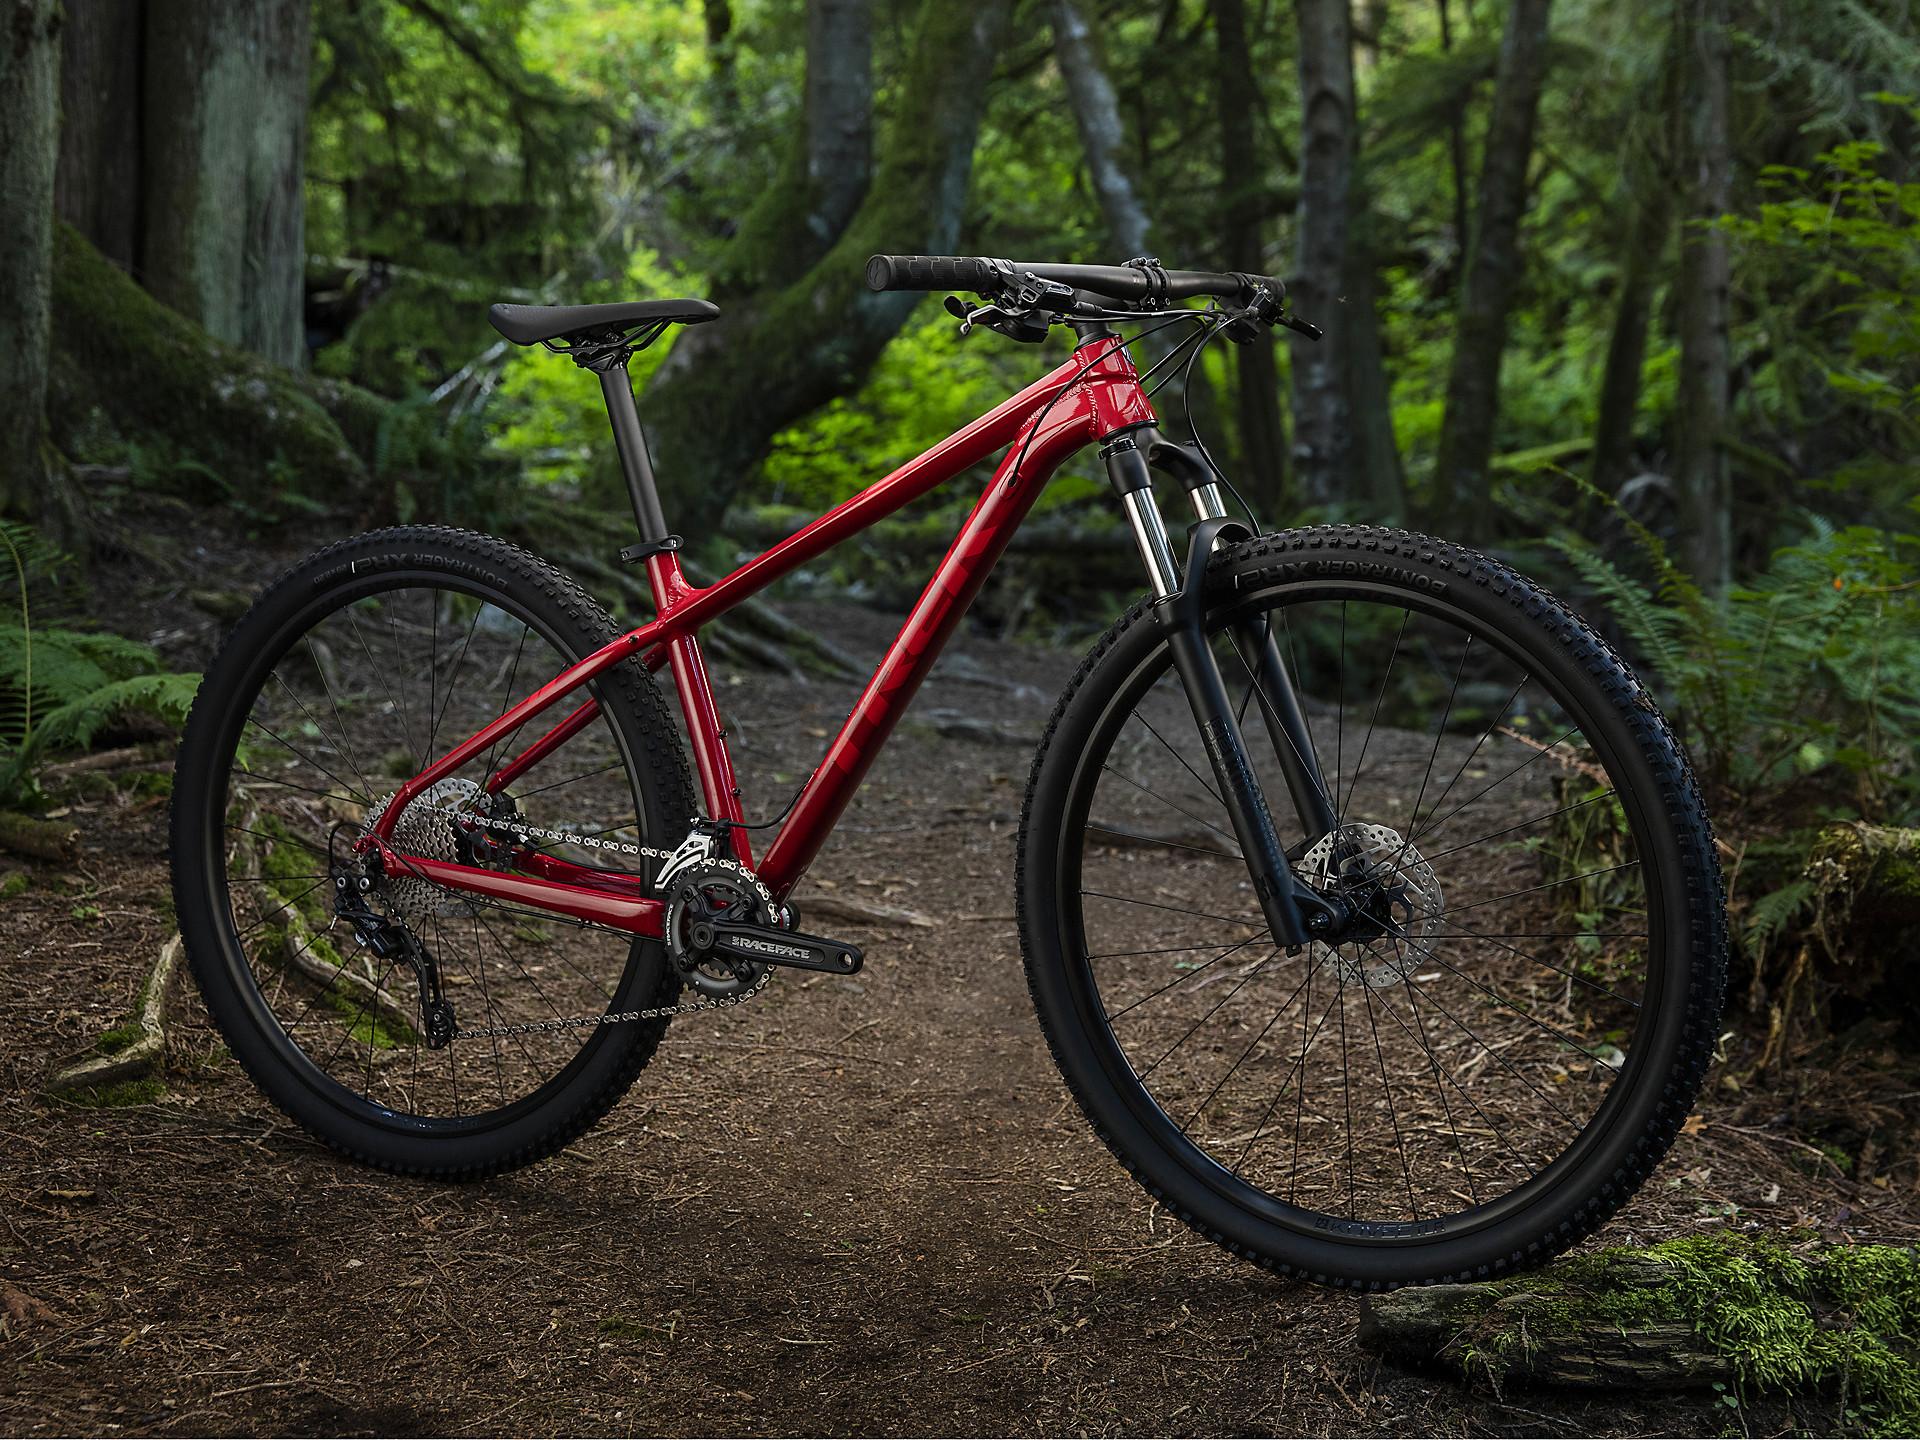 acd5dc7e266 X-Caliber 8 | Trek Bikes (AU)